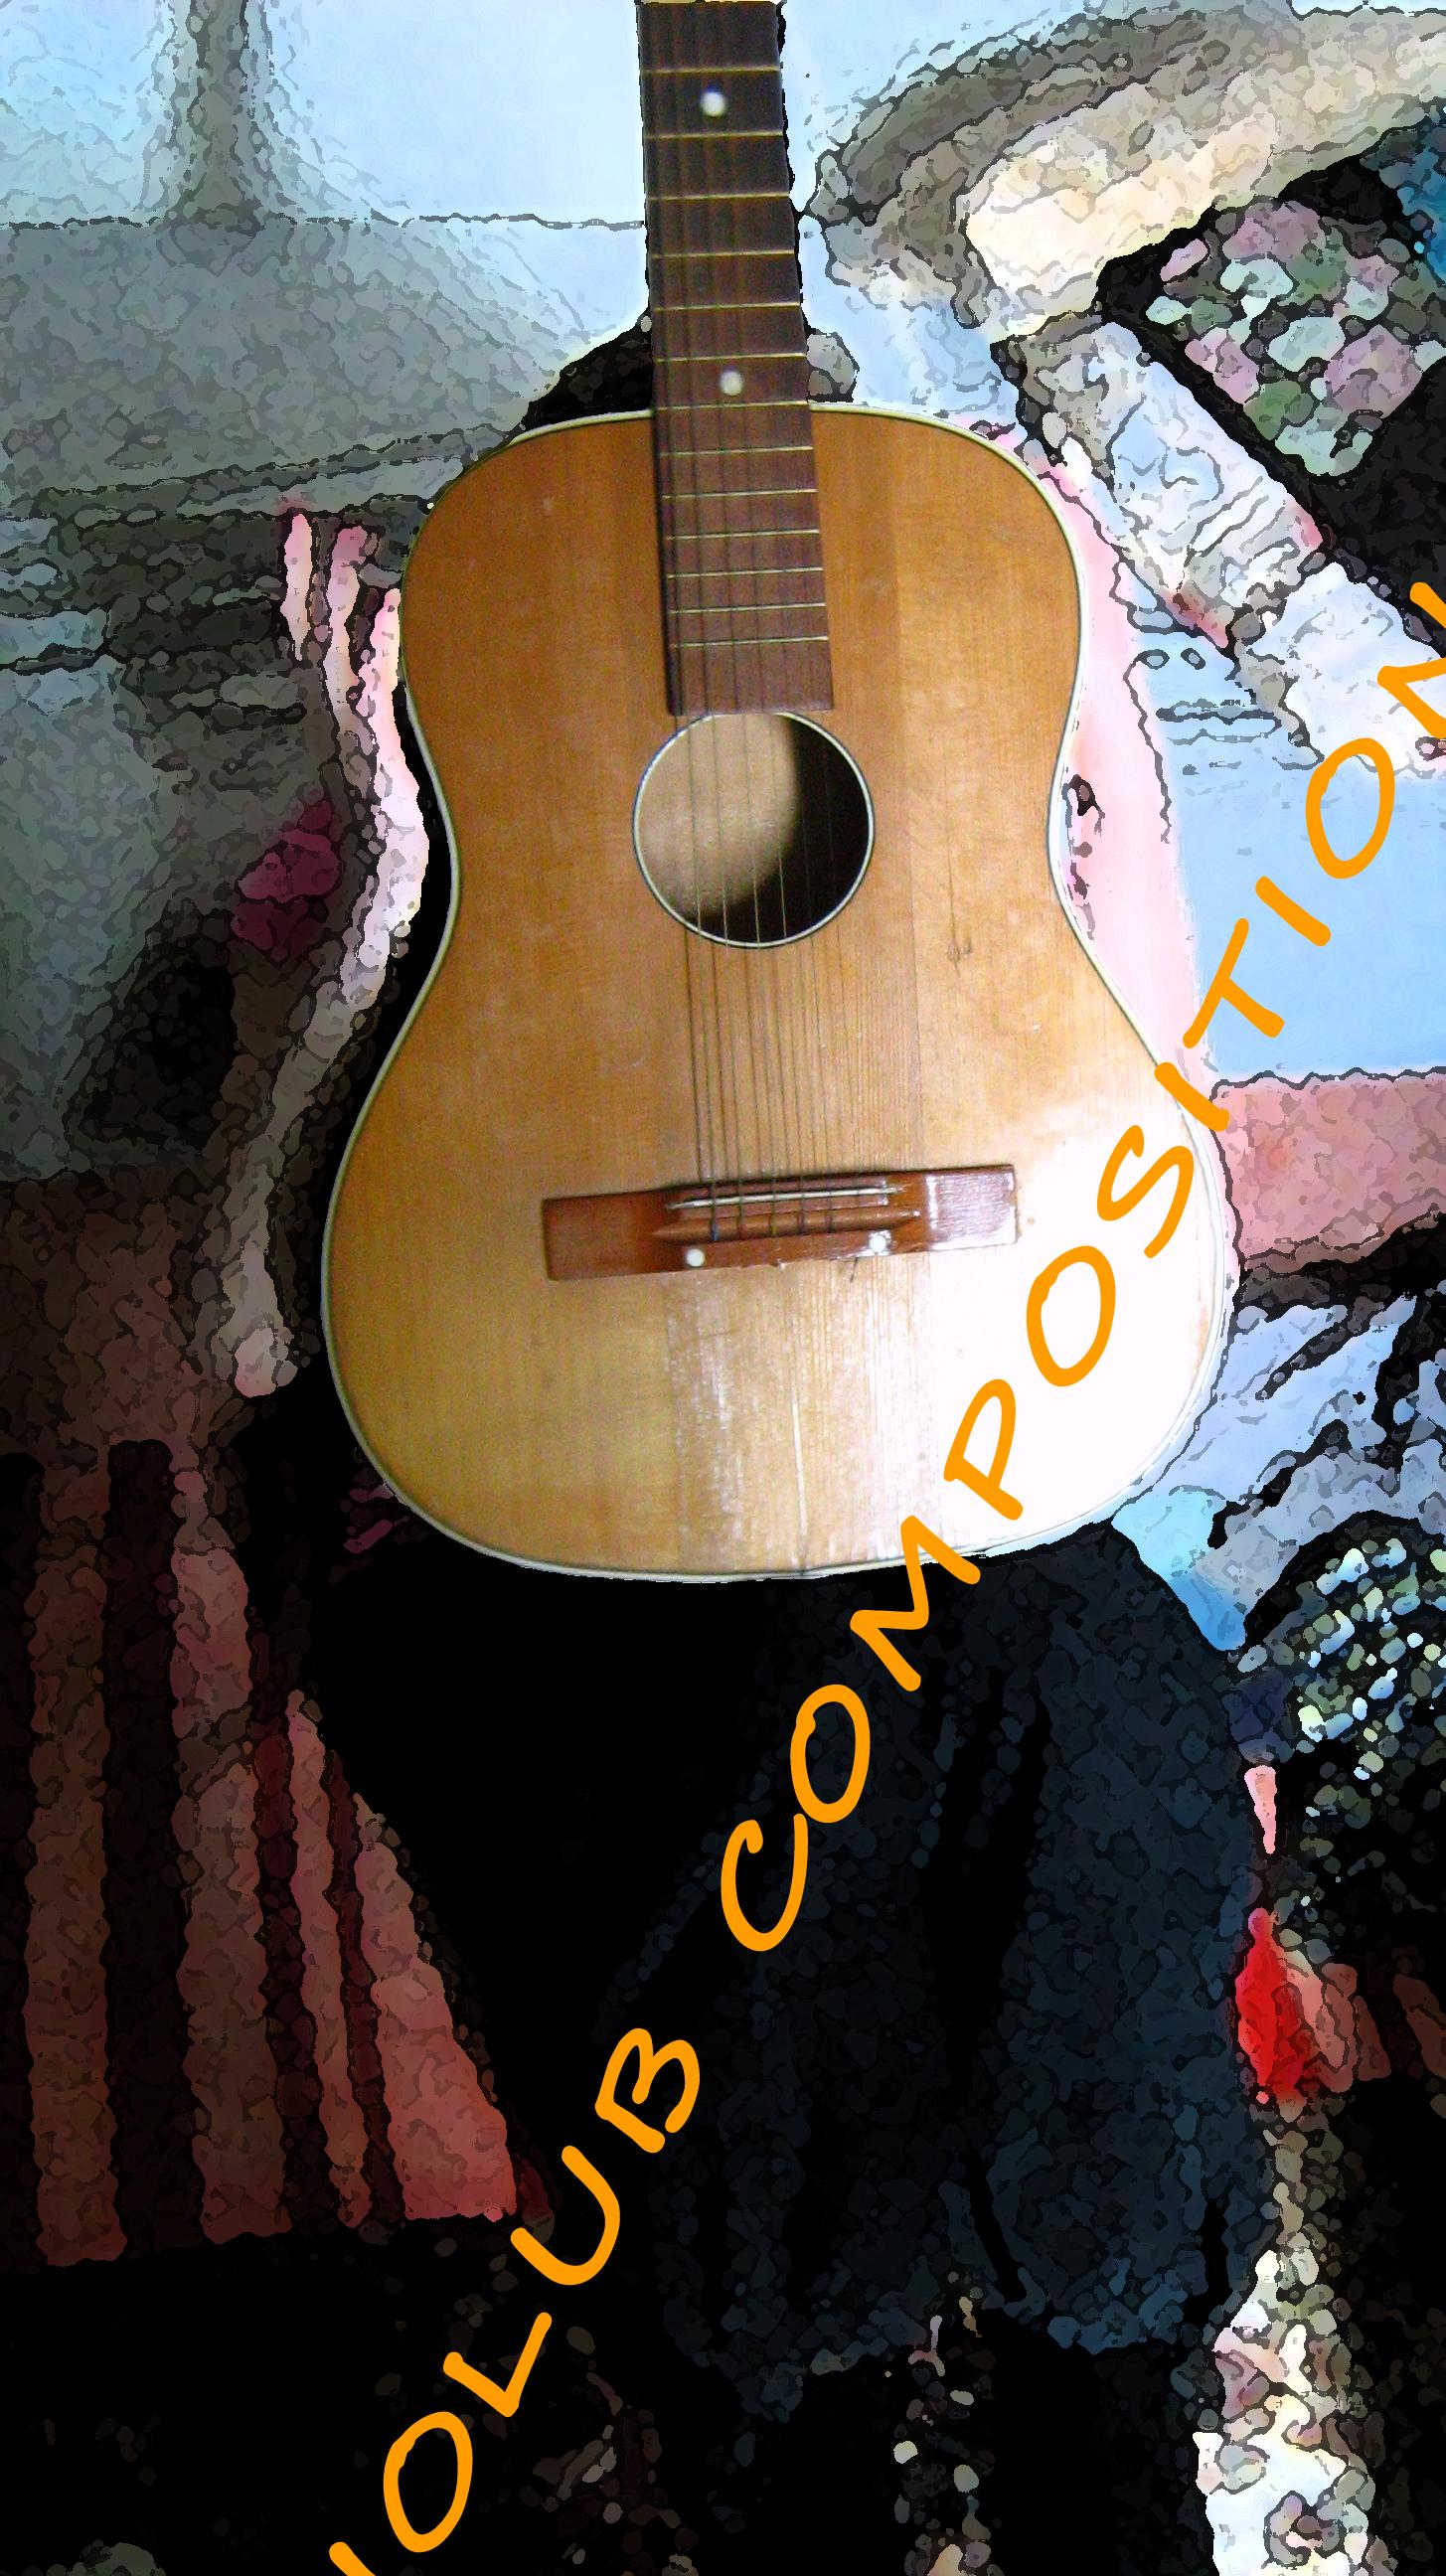 kytarová láska